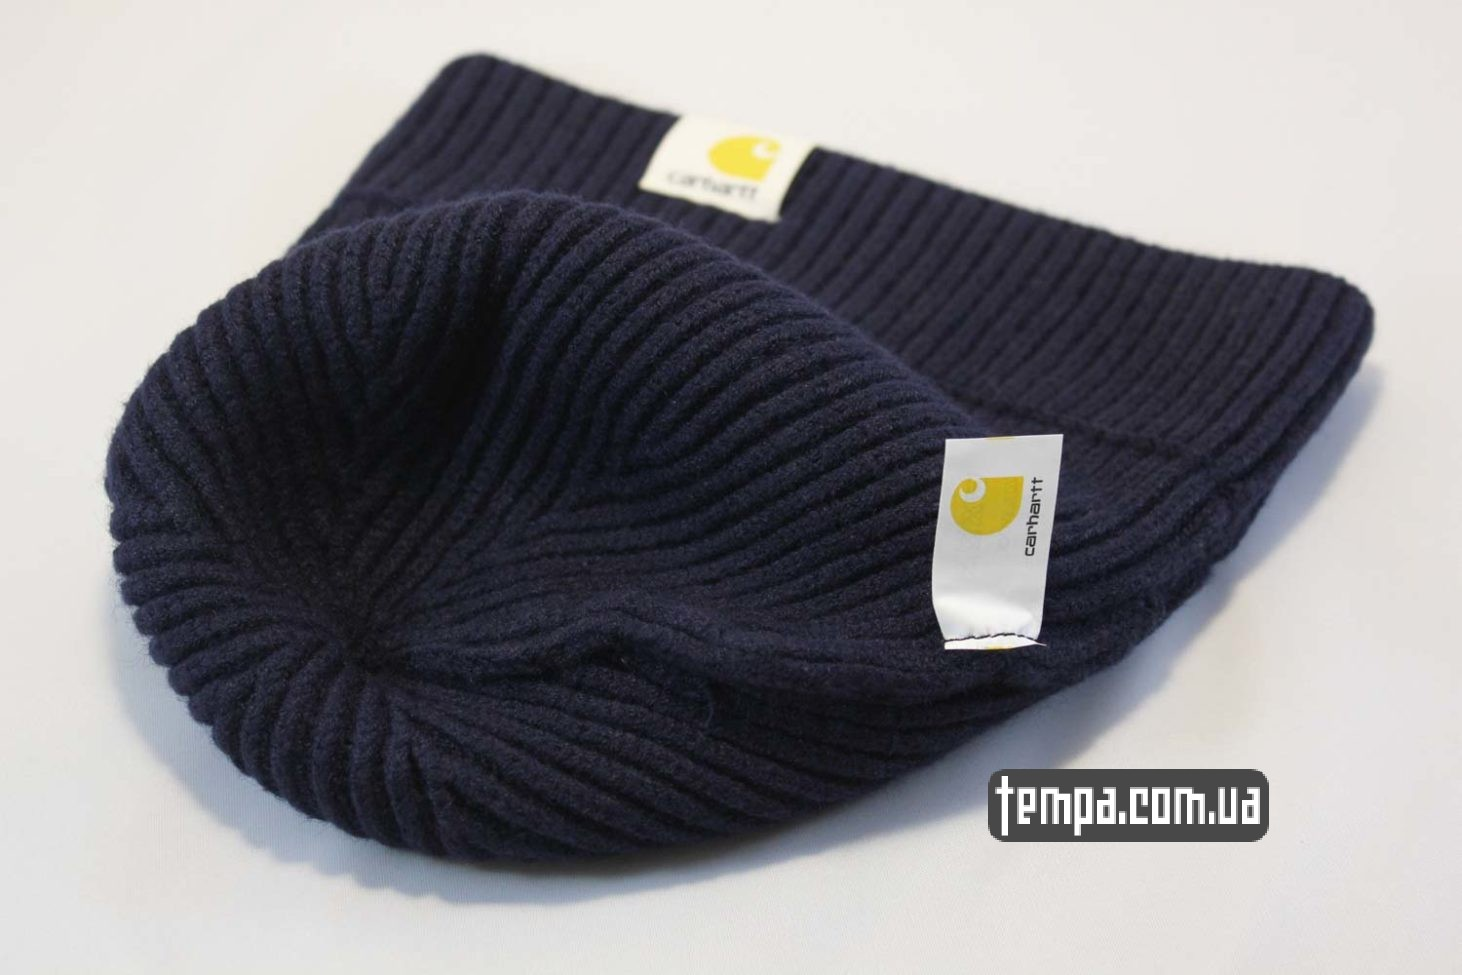 теплая мягка зимняя шапка beanie Carhartt Blue синяя магазин купить